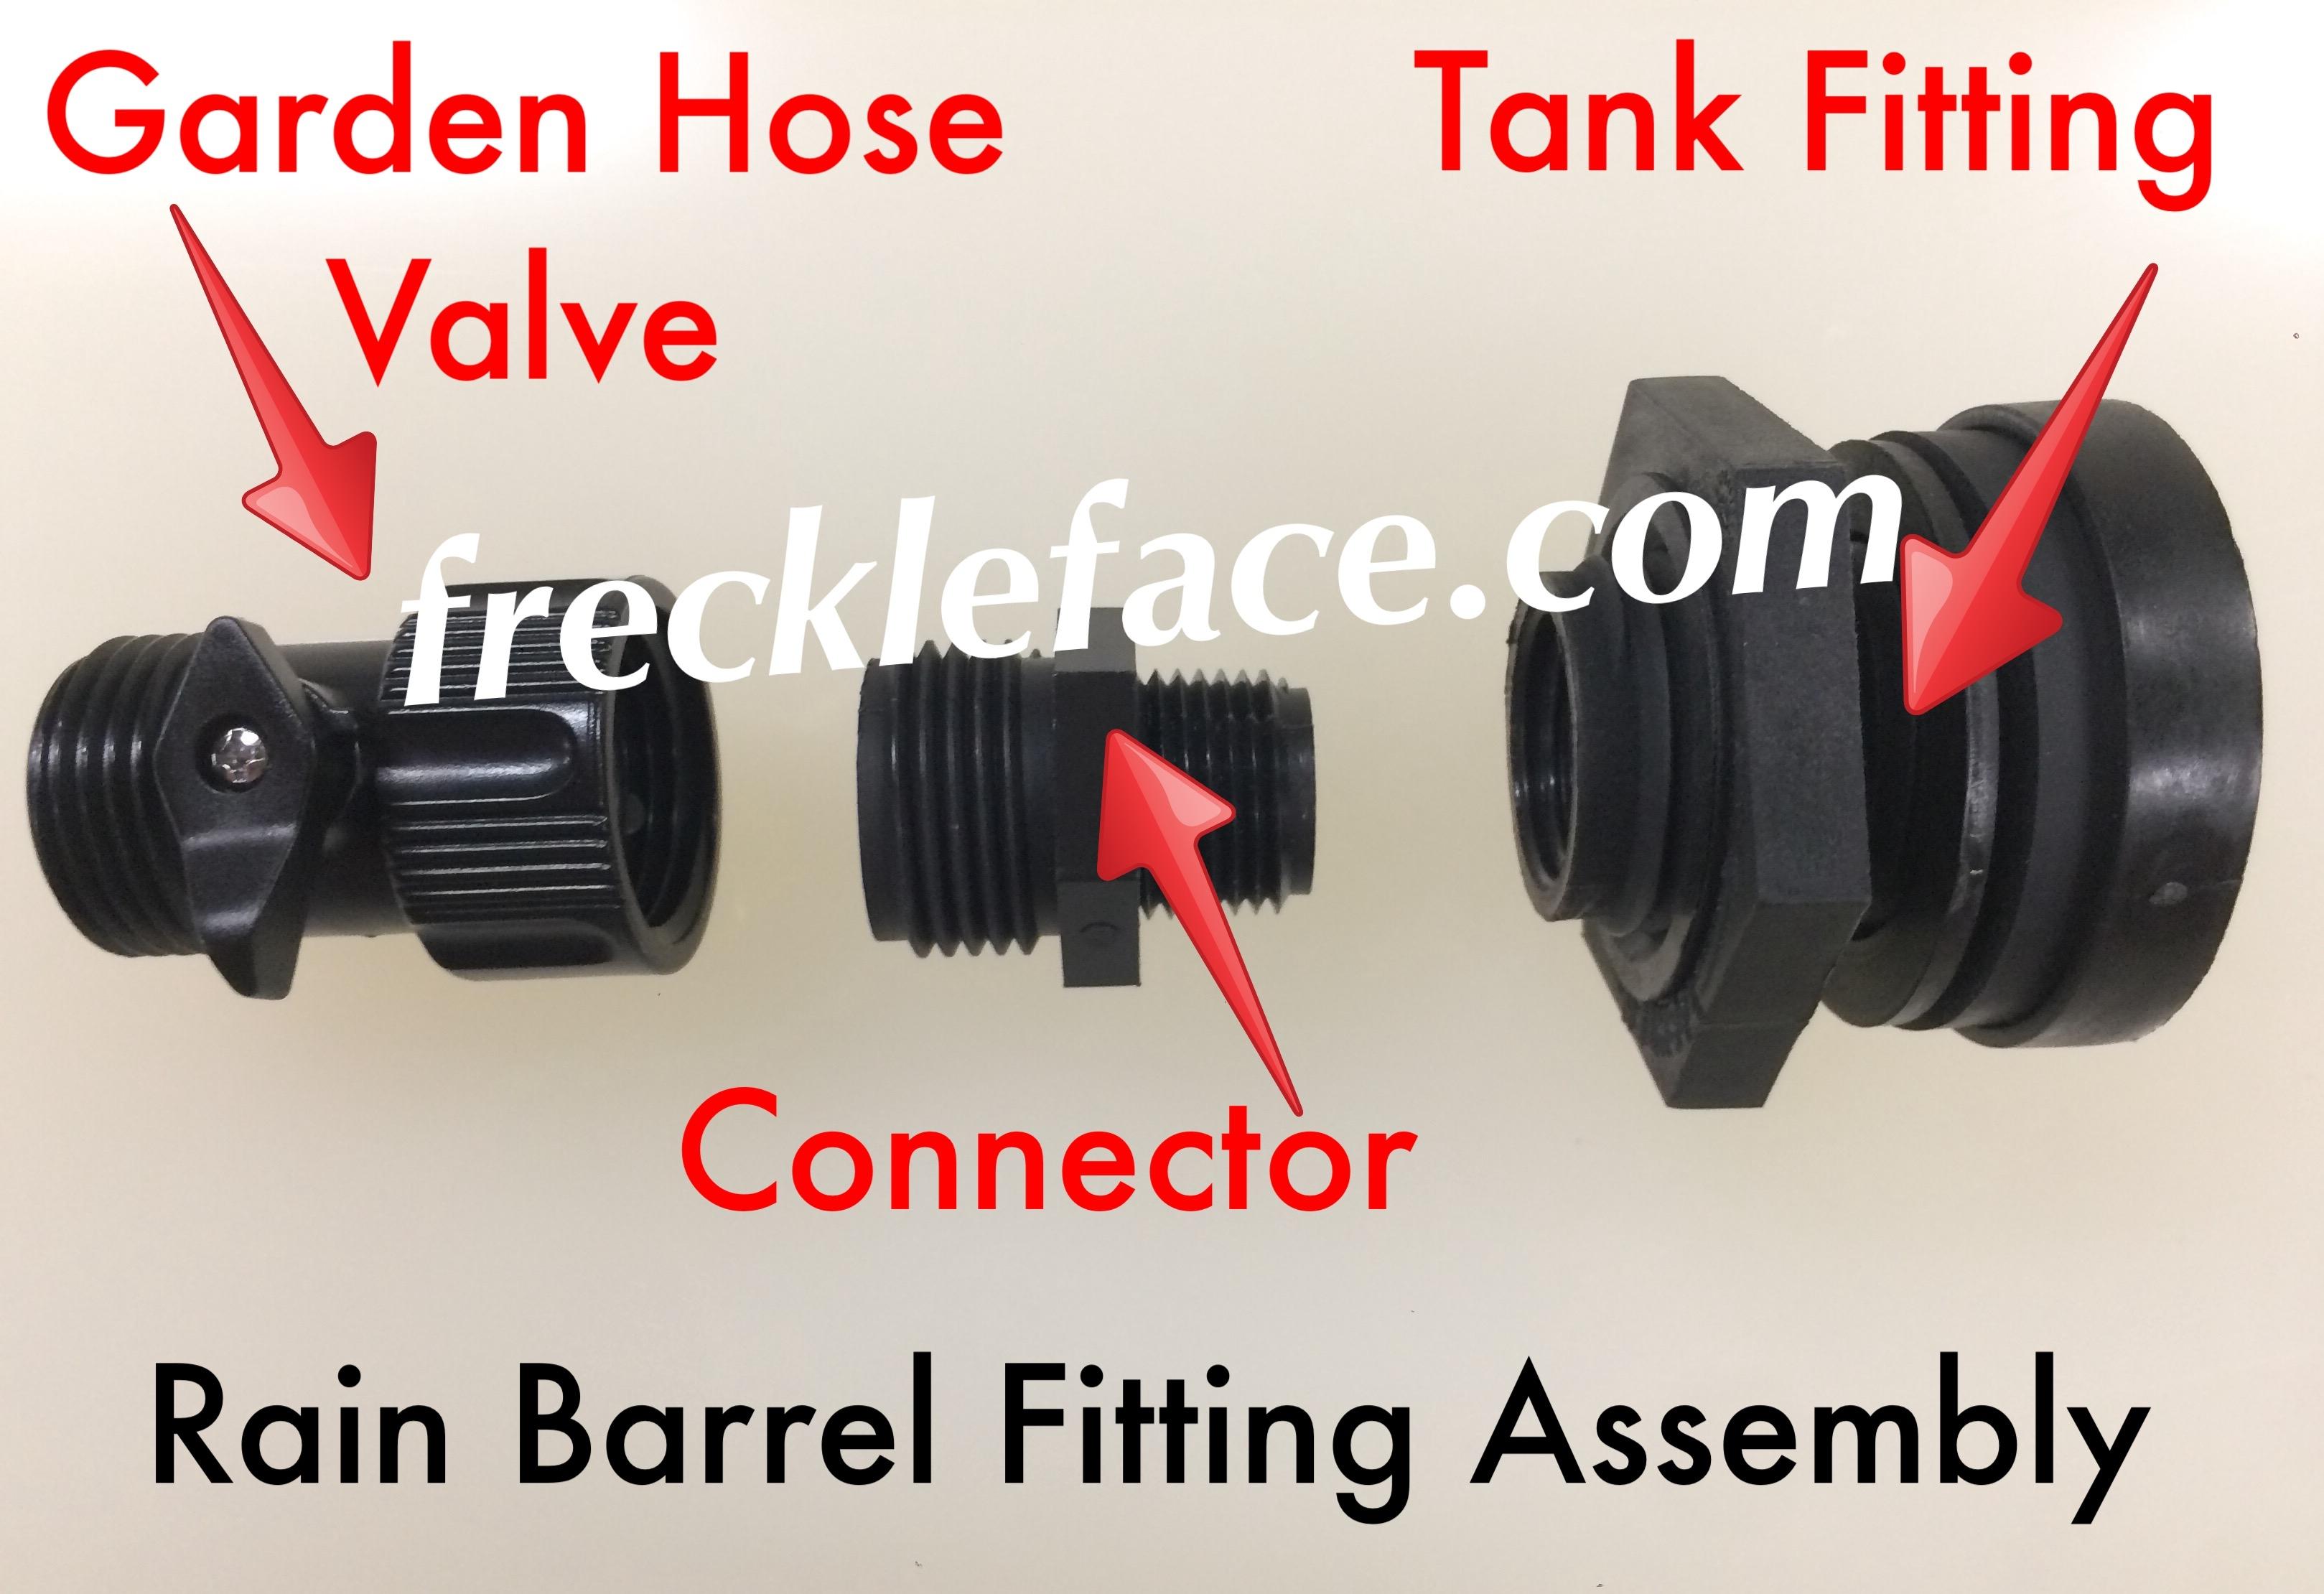 Ideas, faucet kit for rain barrel faucet kit for rain barrel rain barrel fittings water barrel fittings rain barrel water 3237 x 2220  .